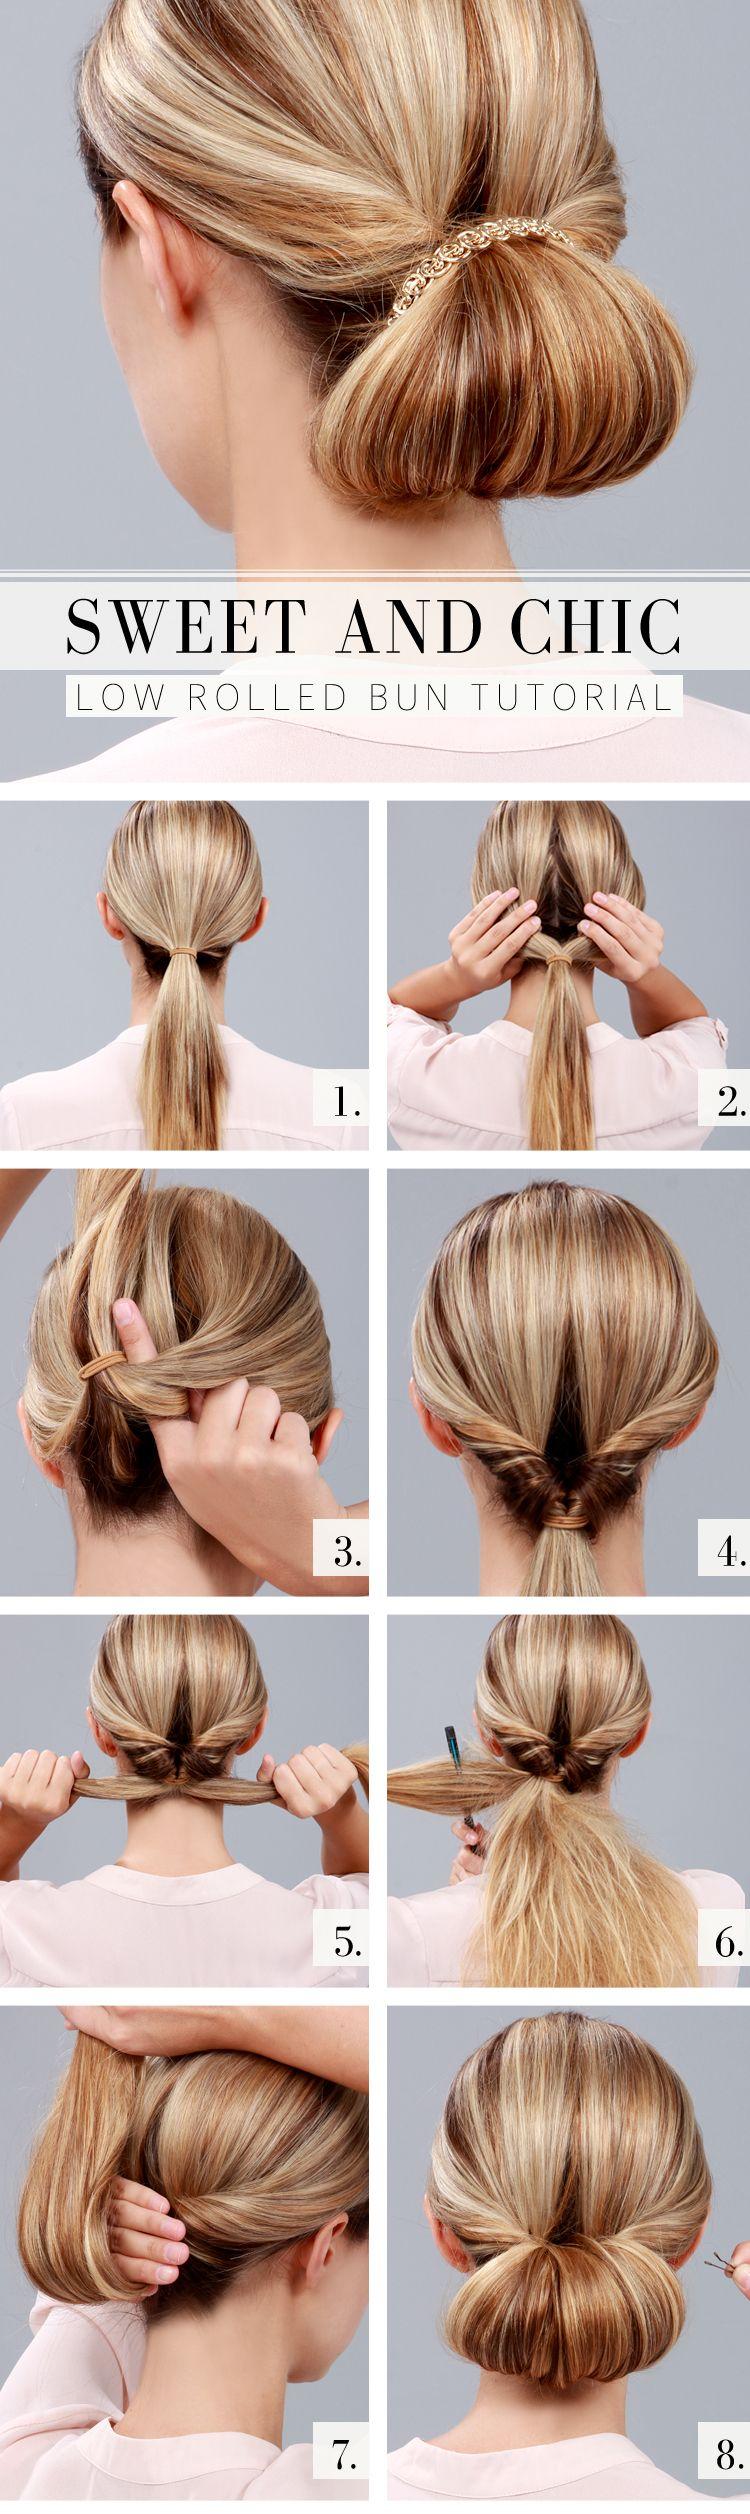 Best Hairstyle Software Long Hair Tutorial Long Hair Styles Hair Bun Tutorial